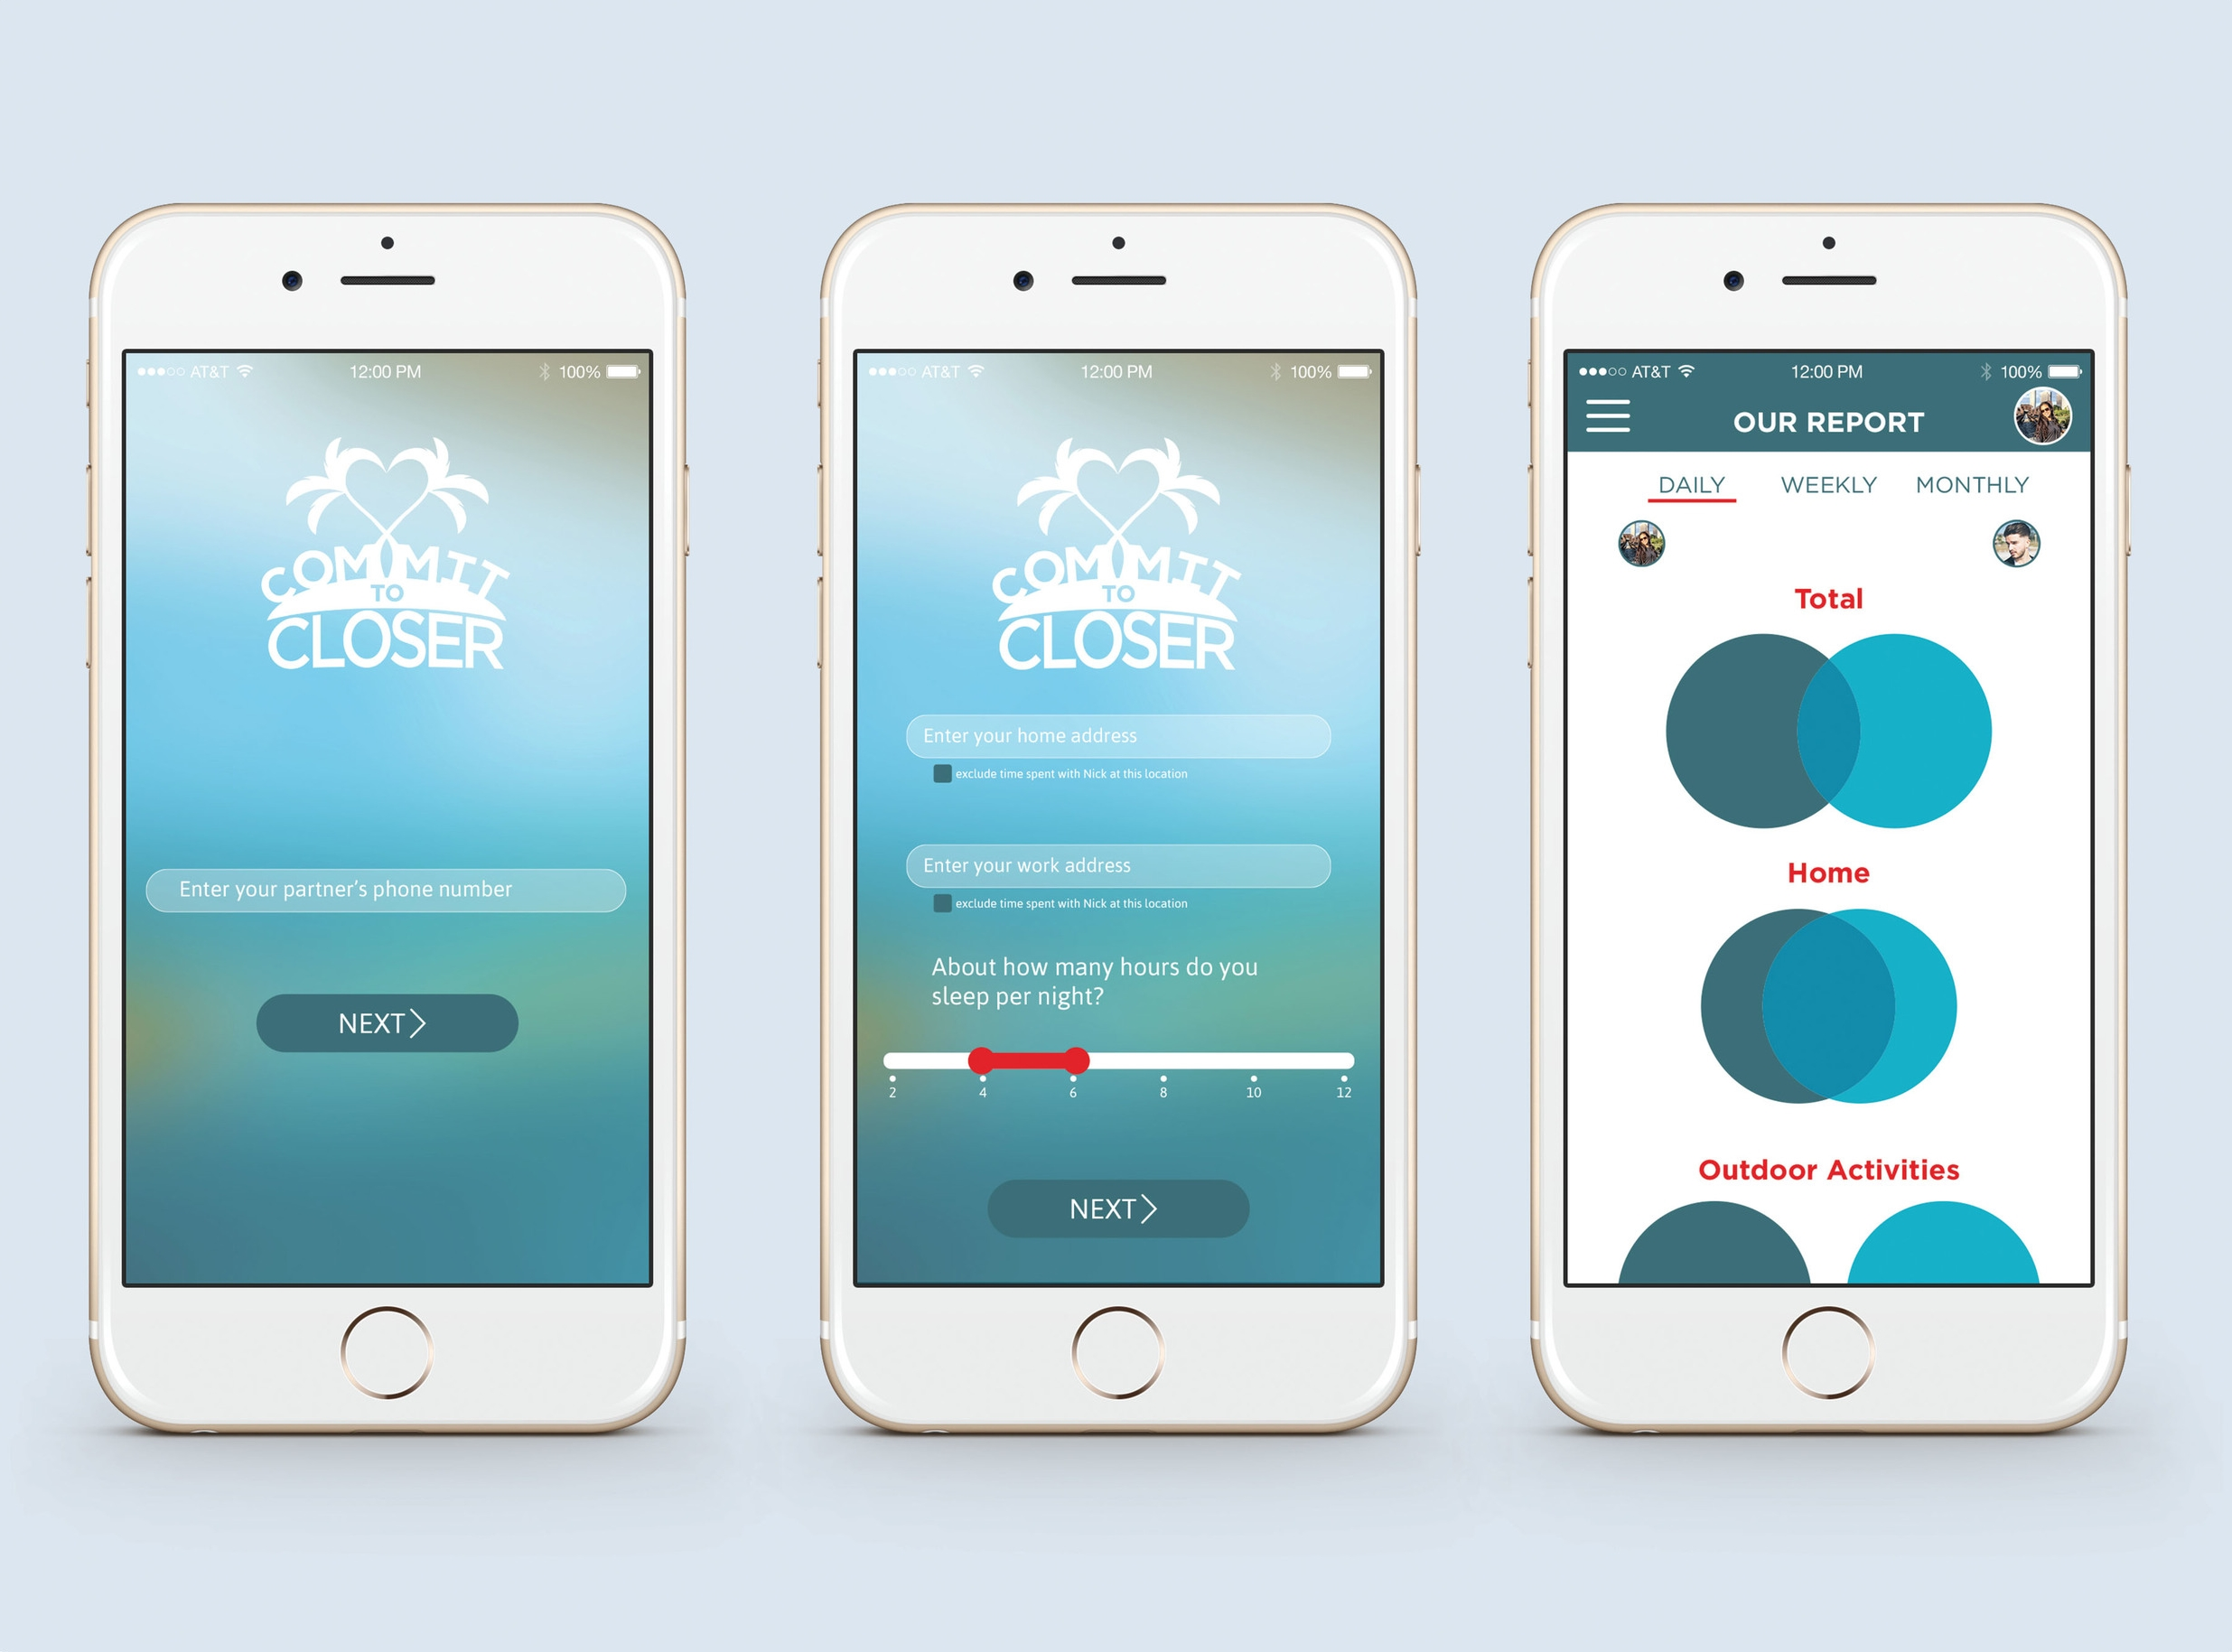 Sandals_App Overview.jpg